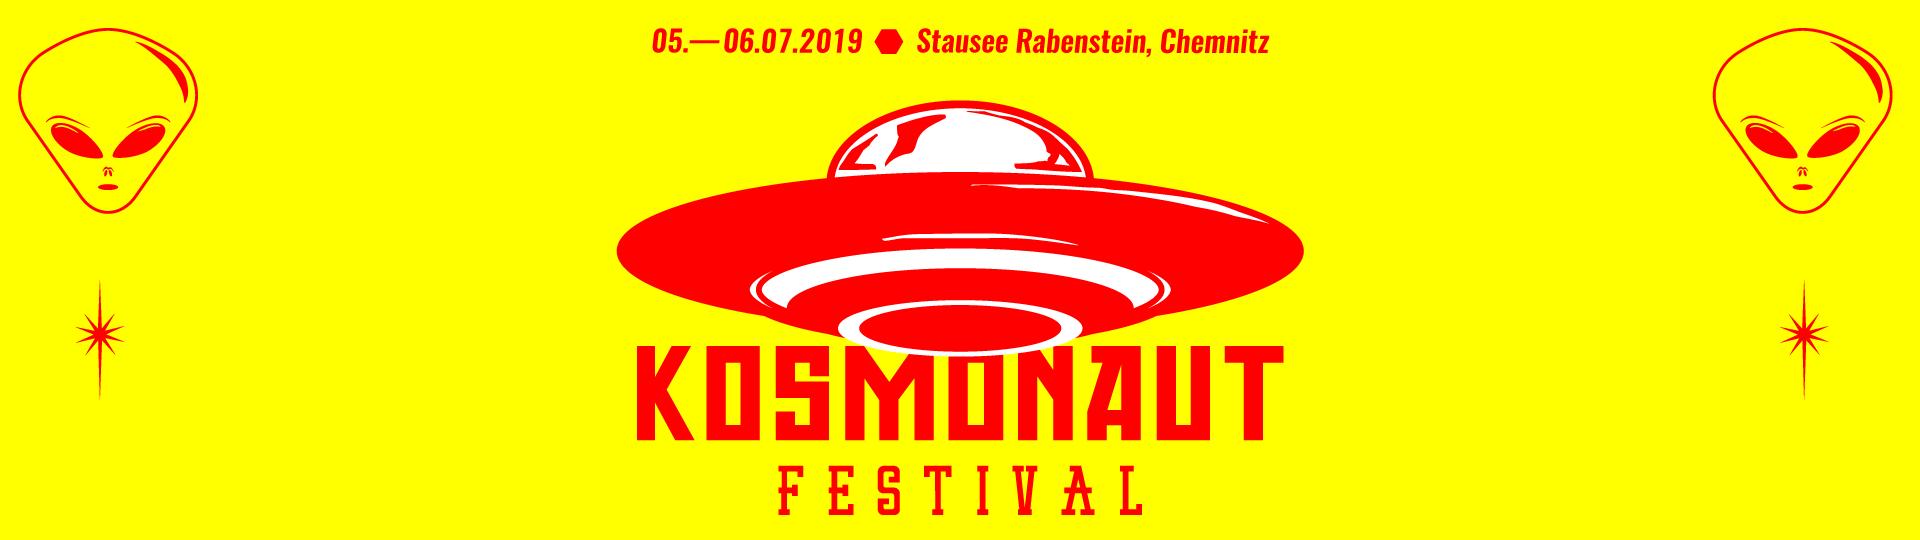 Kosmonaut Festival   InfosKosmonaut Festival